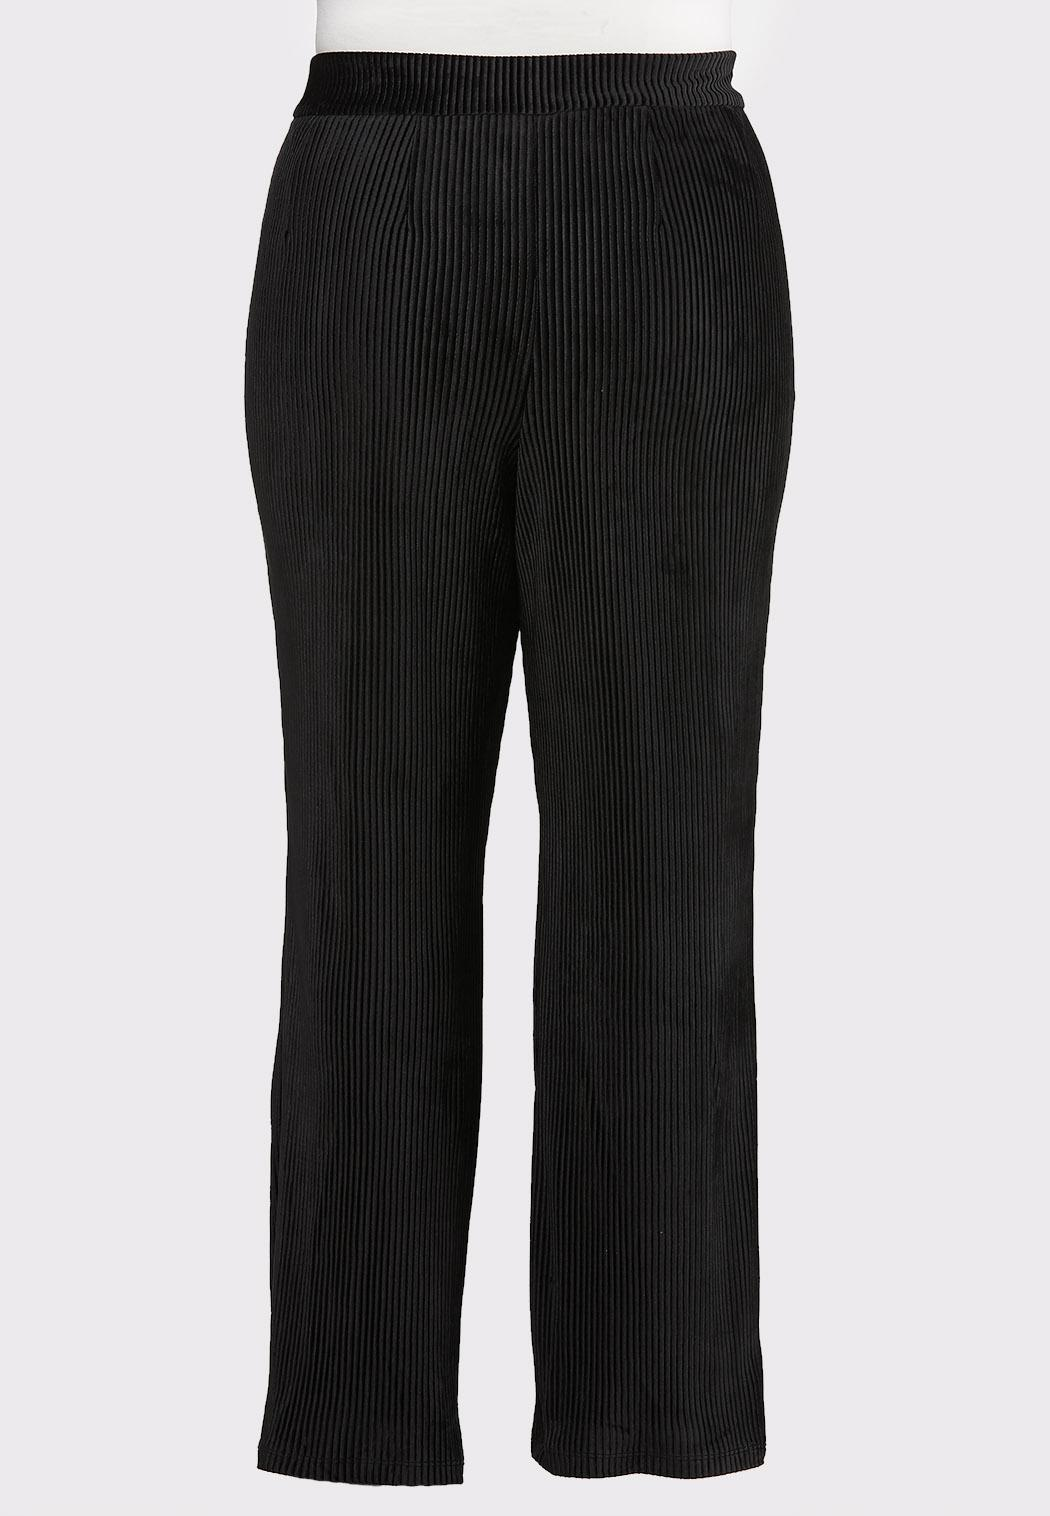 Plus Size Flare Leg Corduroy Pants (Item #44018715)